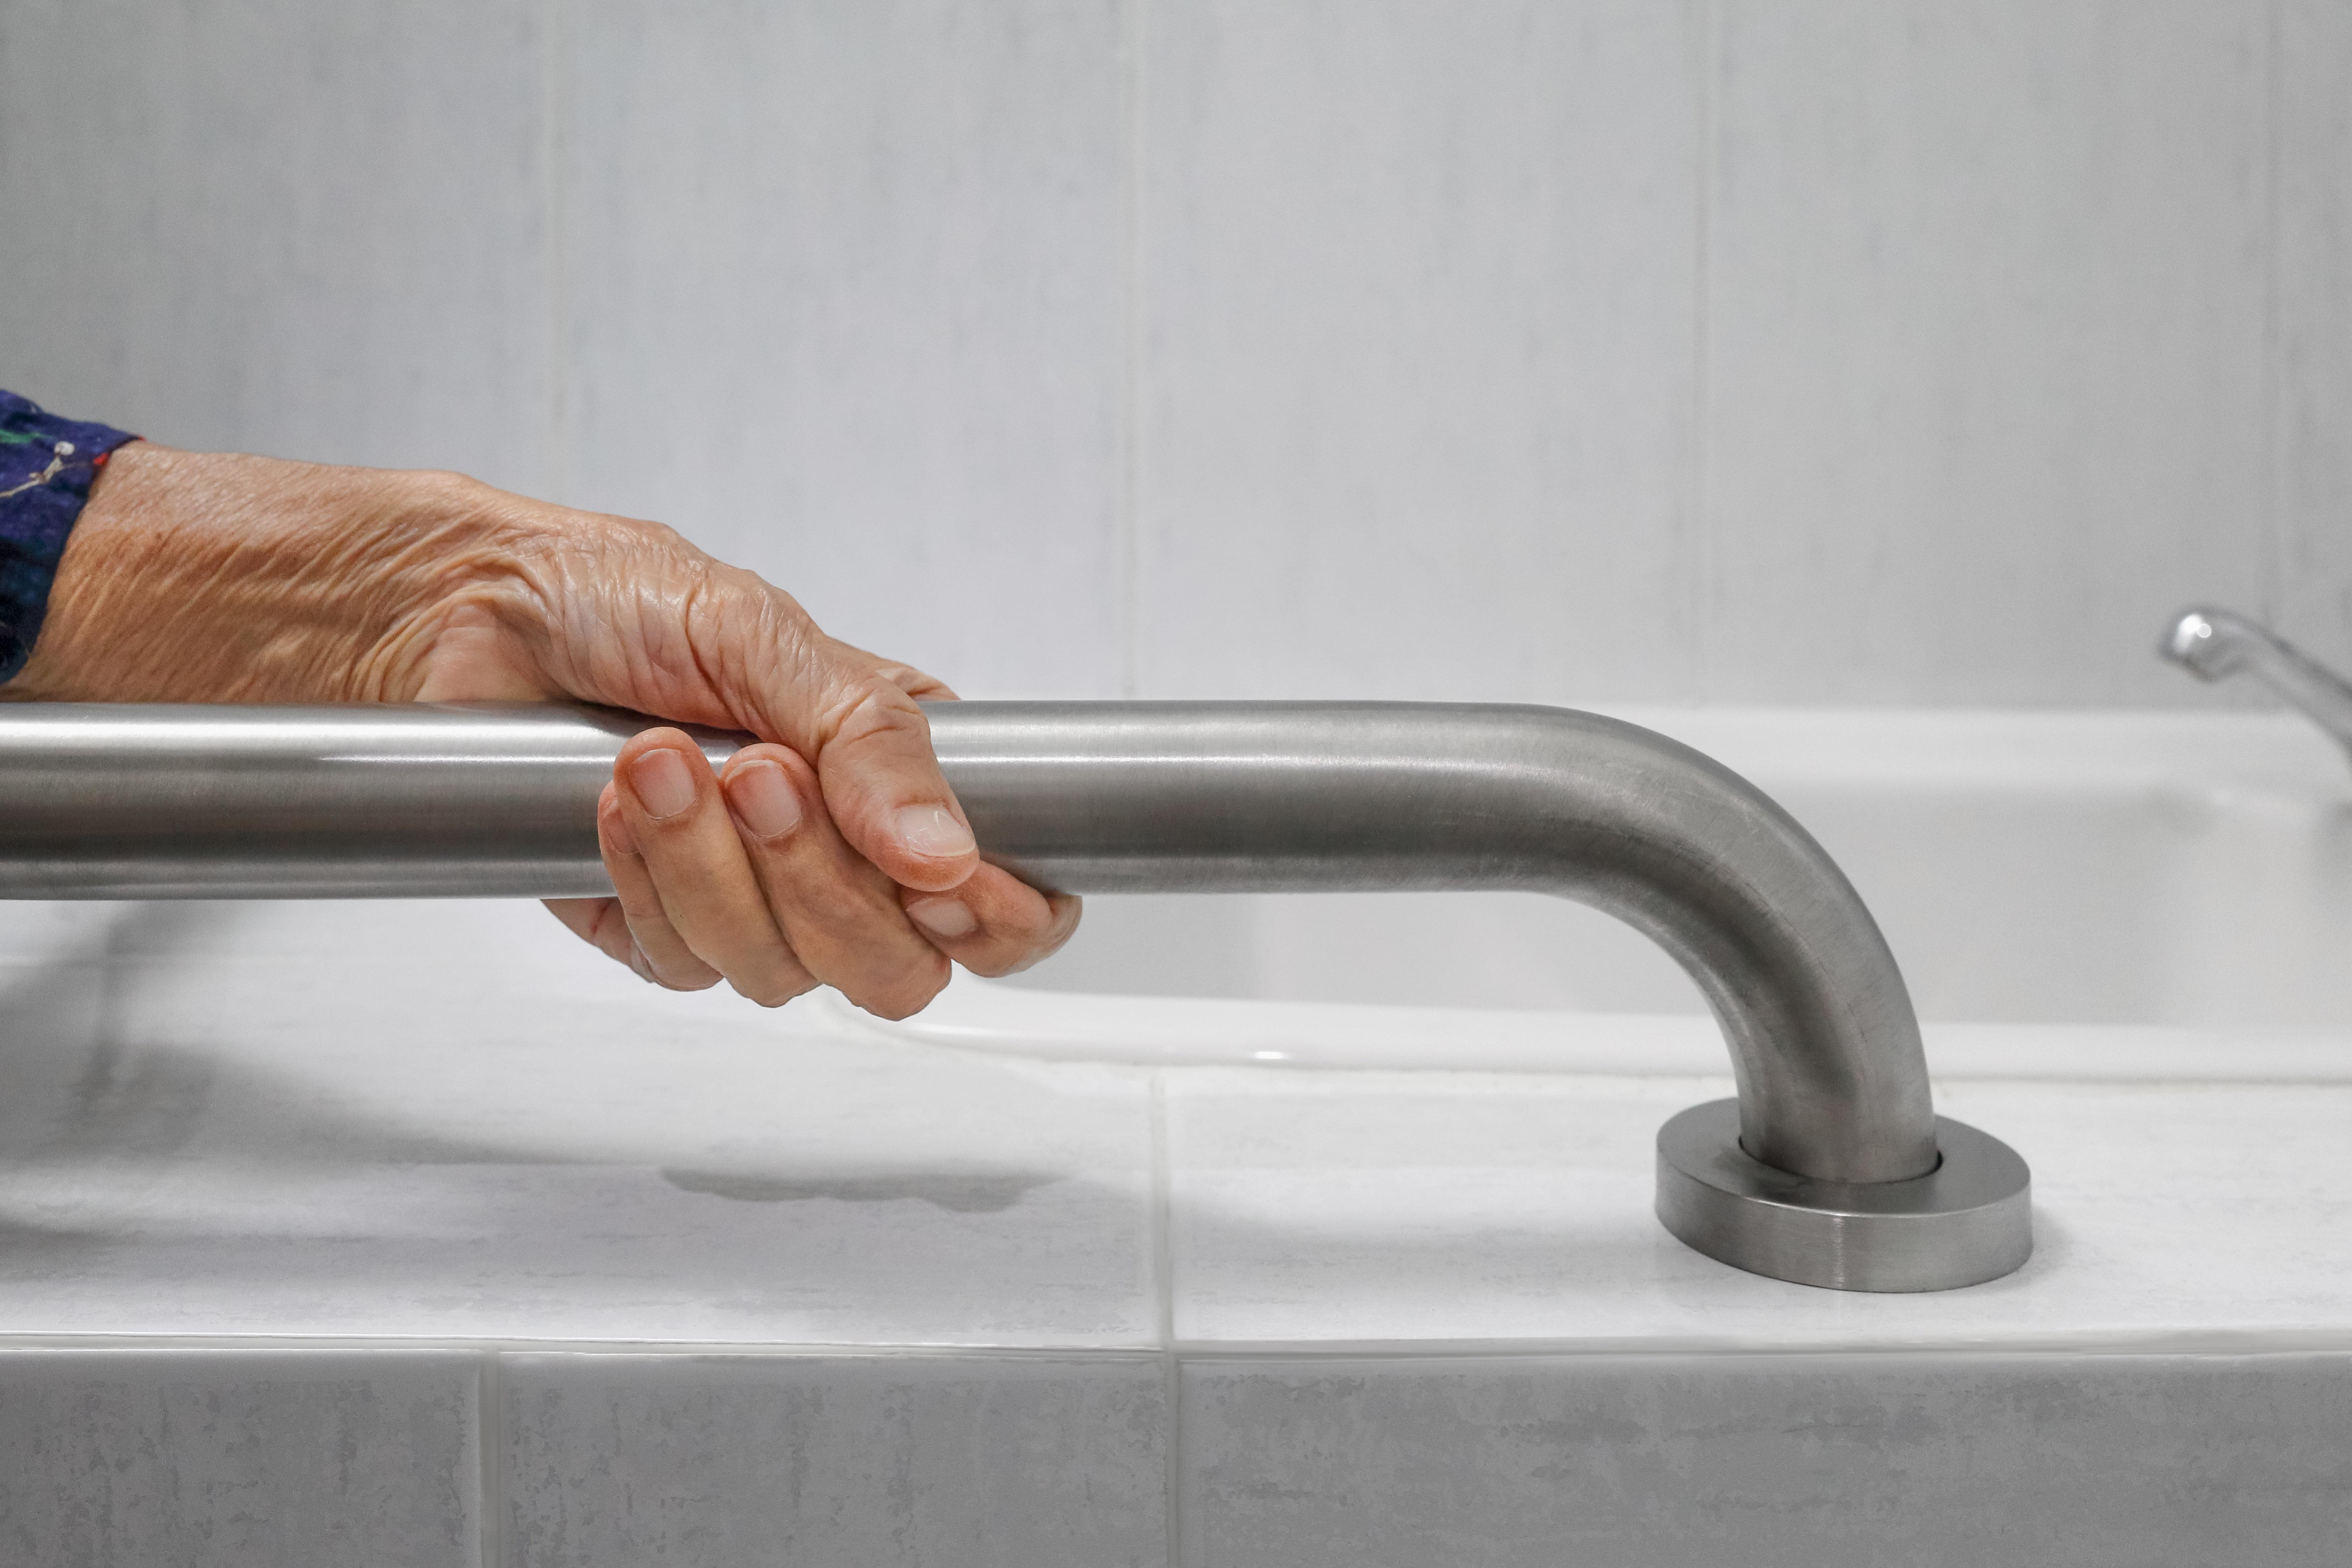 Elderly person holding on handrail in bathroom